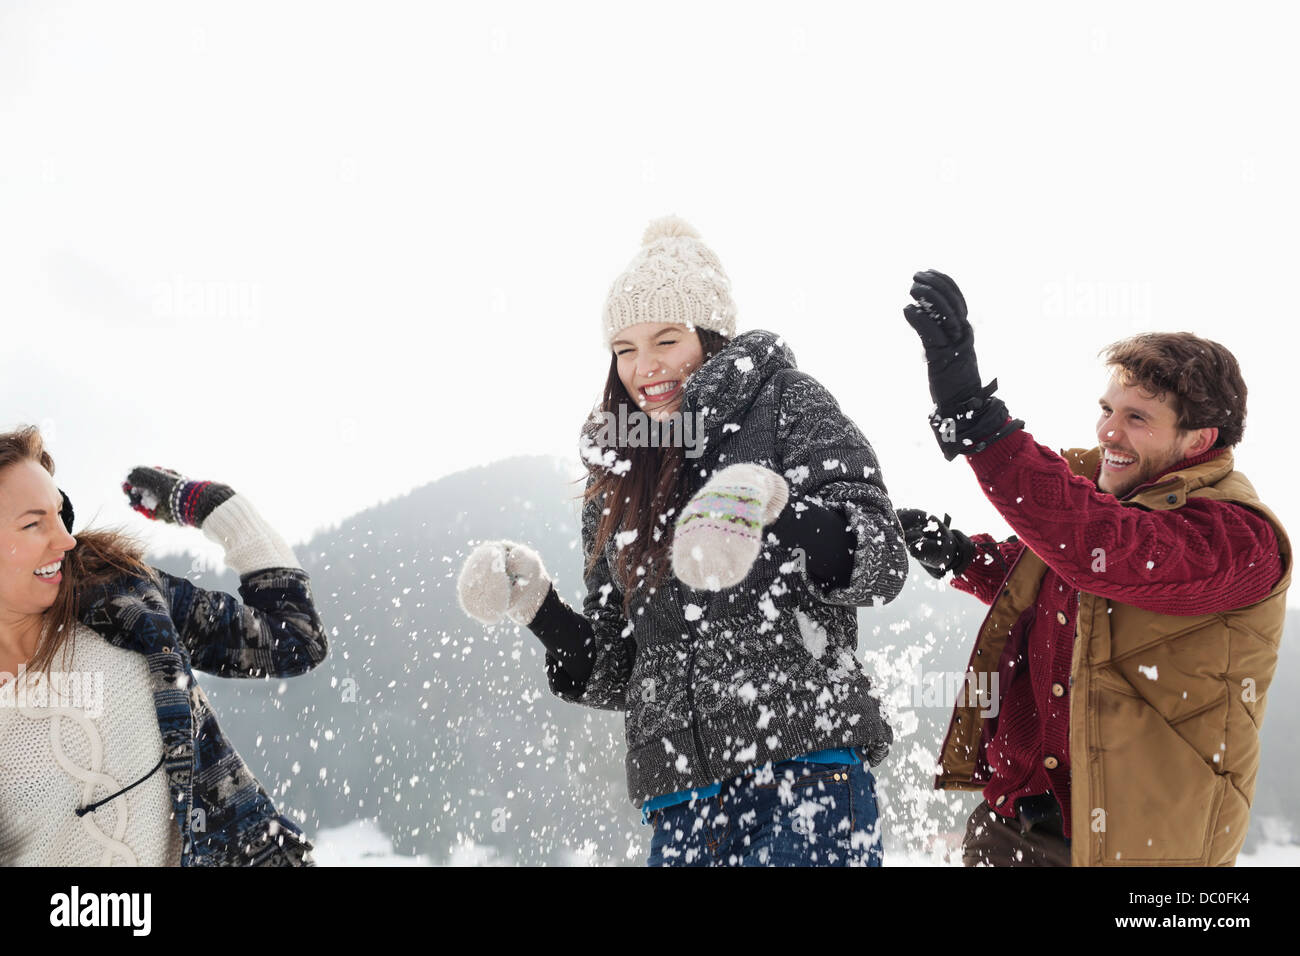 Couple enjoying snowball fight - Stock Image